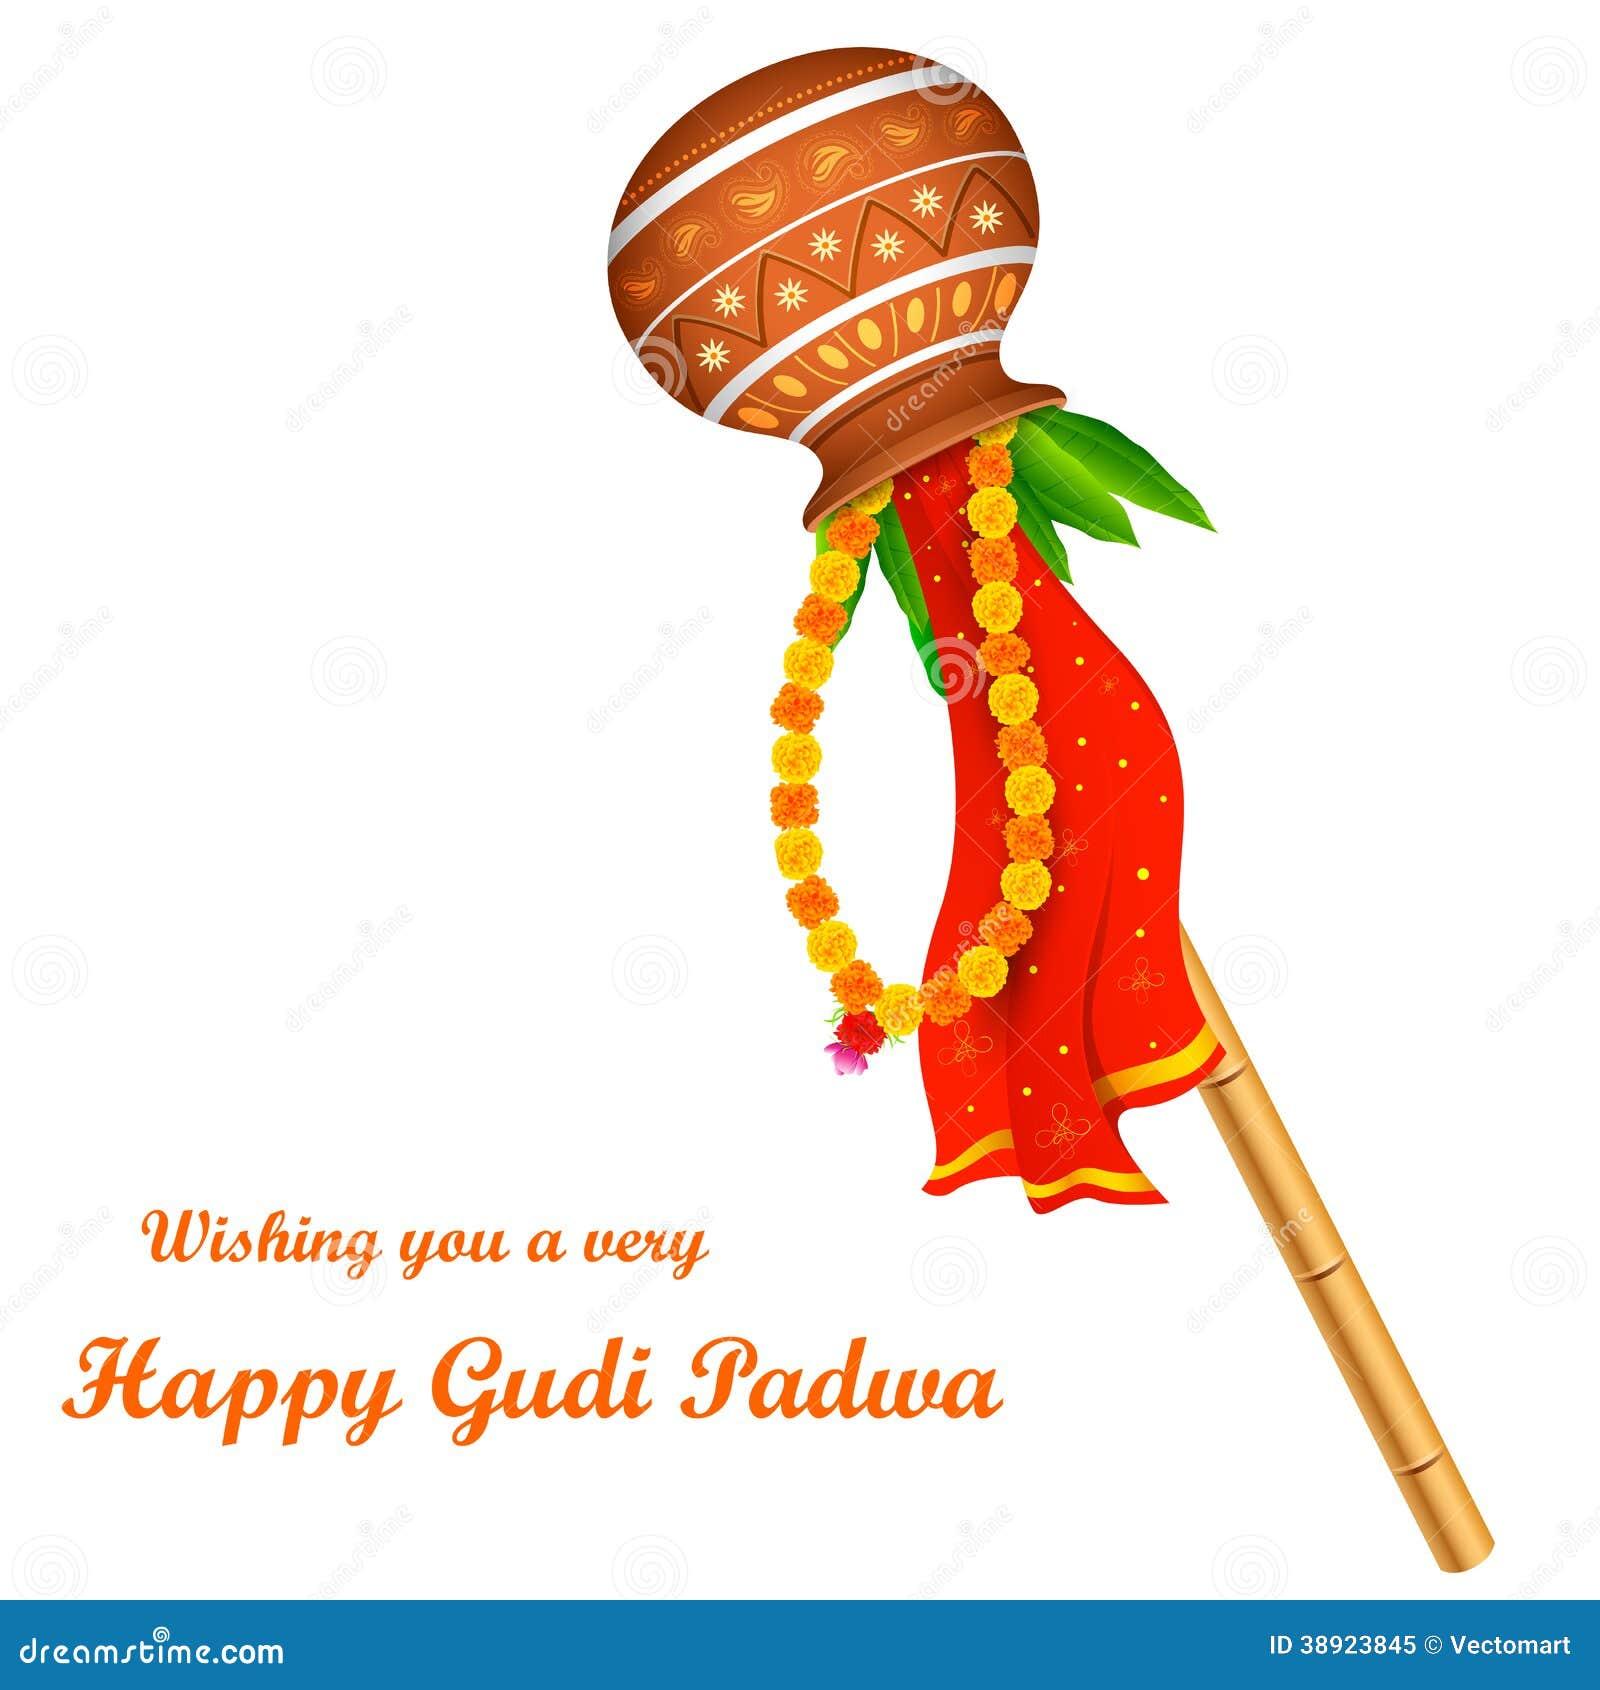 Illustration of Gudi Padwa ( Lunar New Year ) celebration of India.